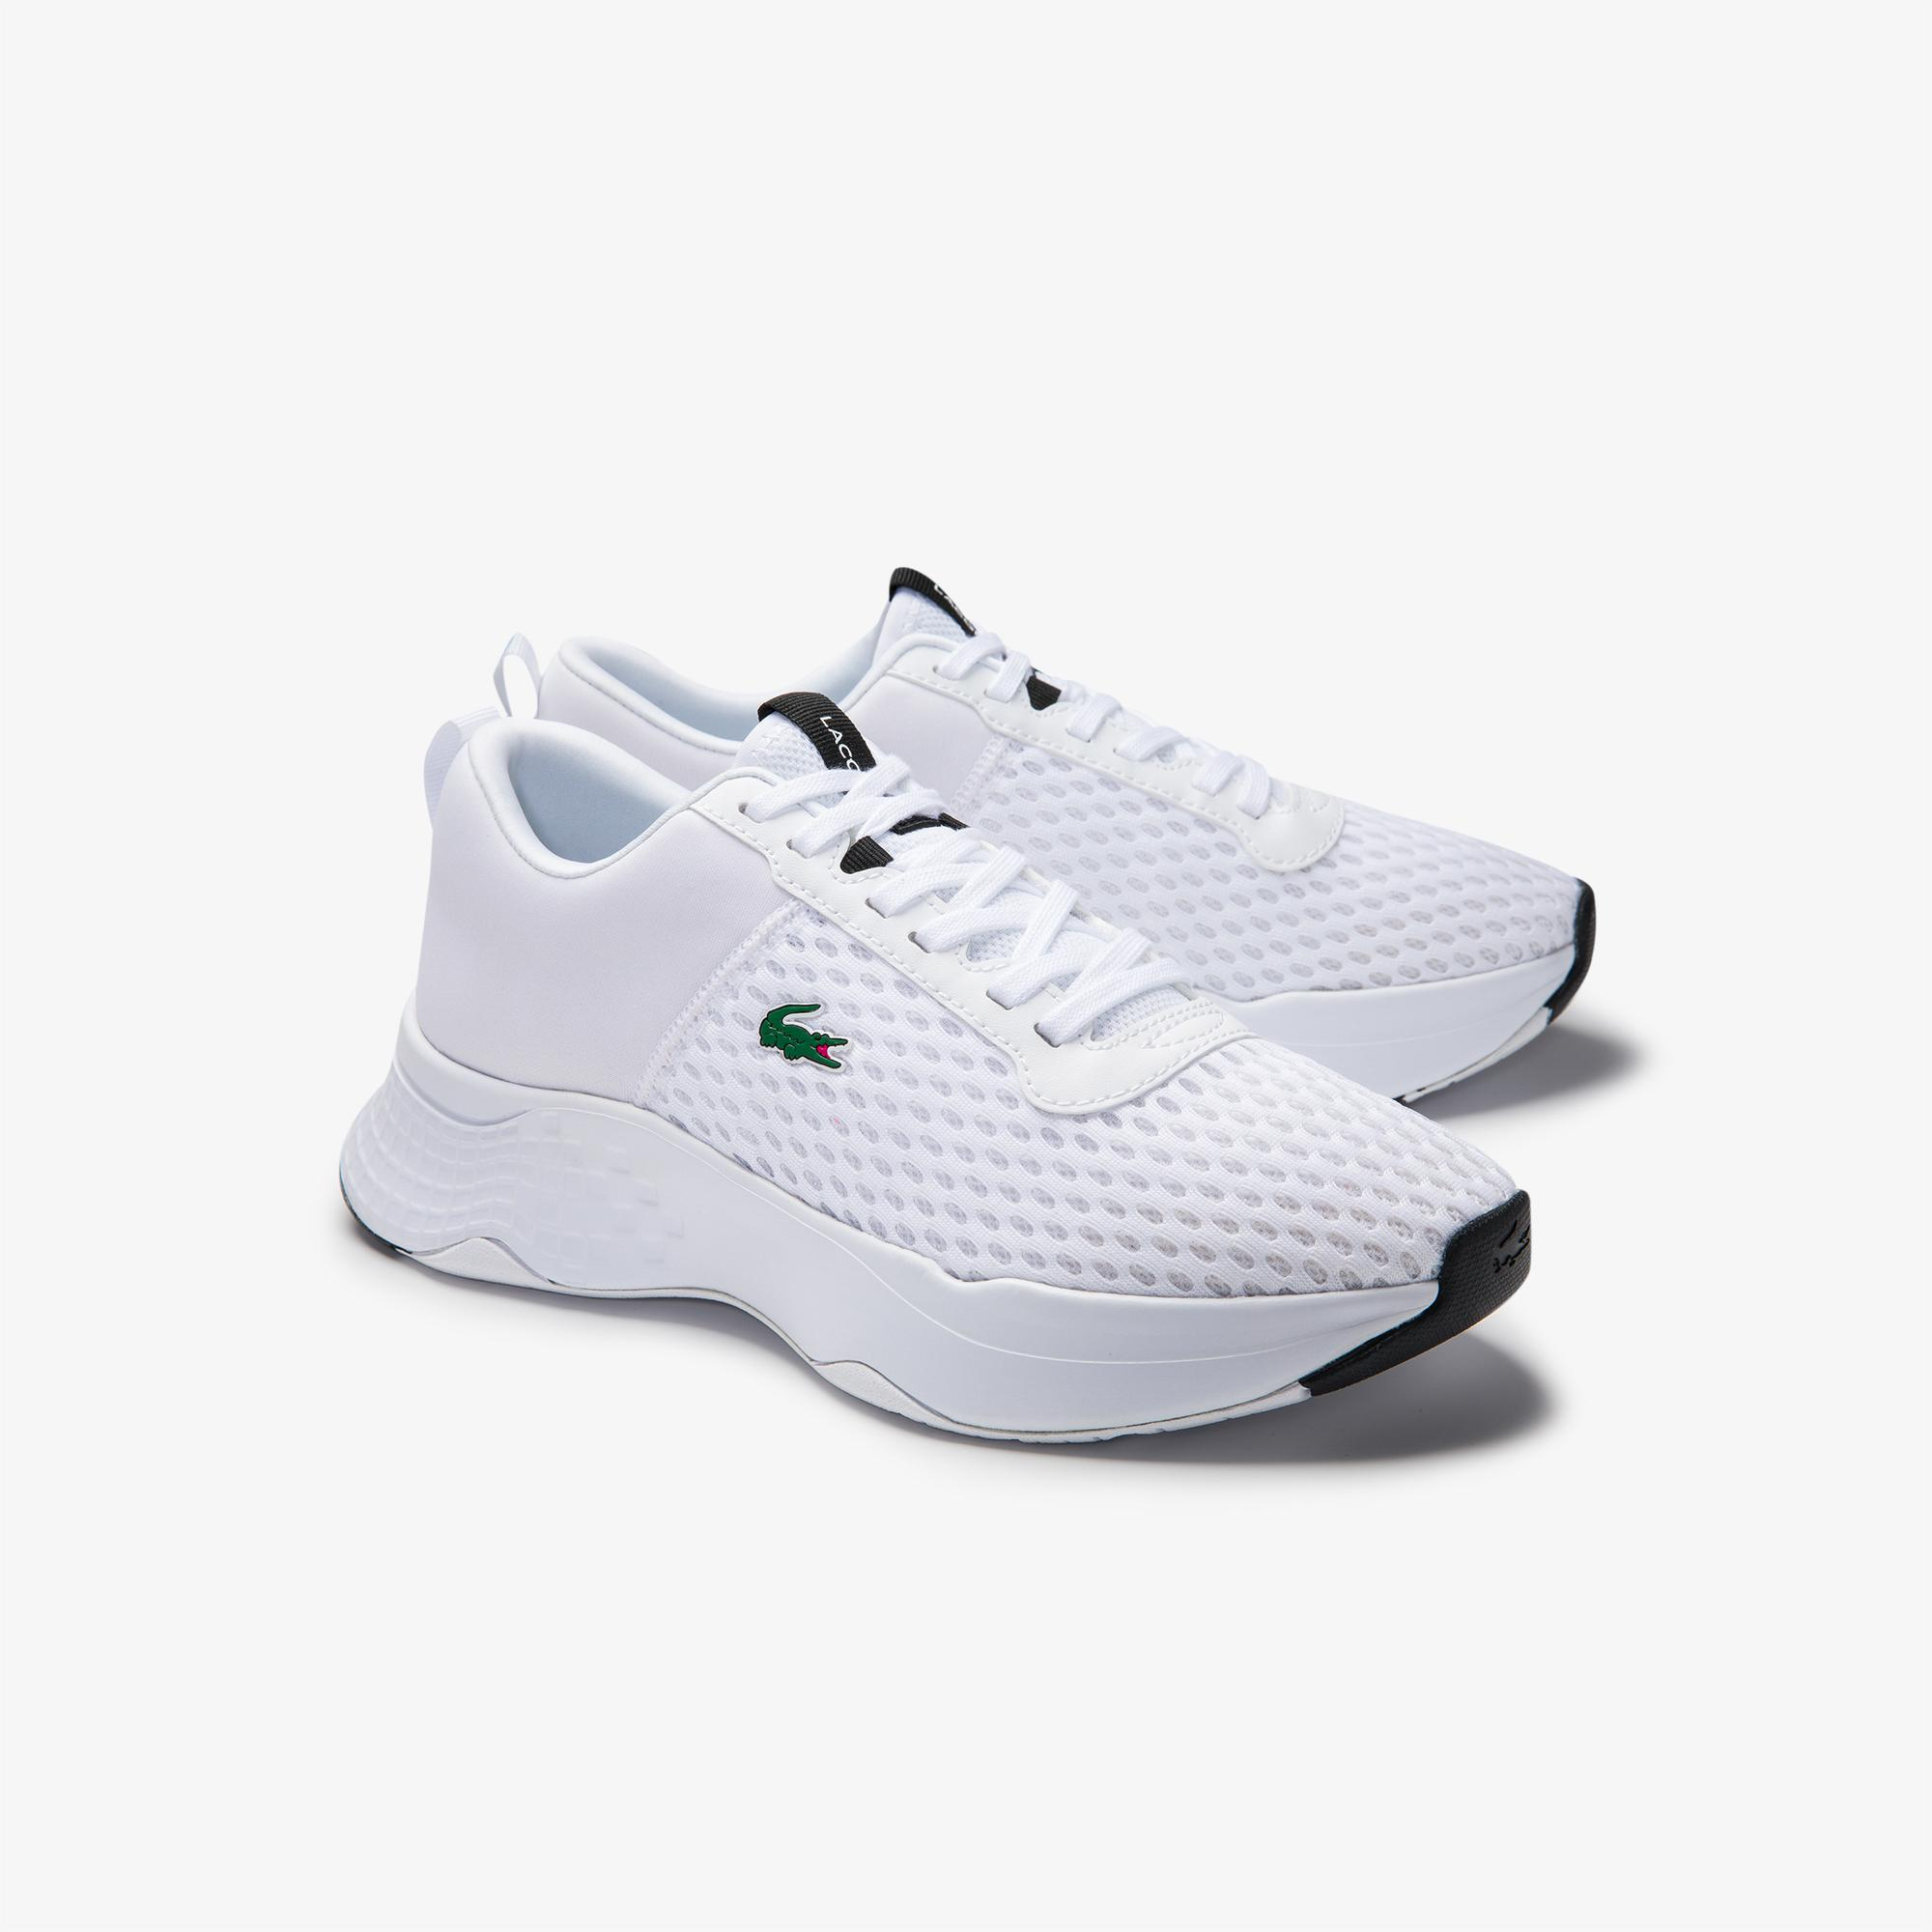 Lacoste Court-Drive 0120 1 Suj Wht/Blk Kadın Beyaz - Siyah Sneaker